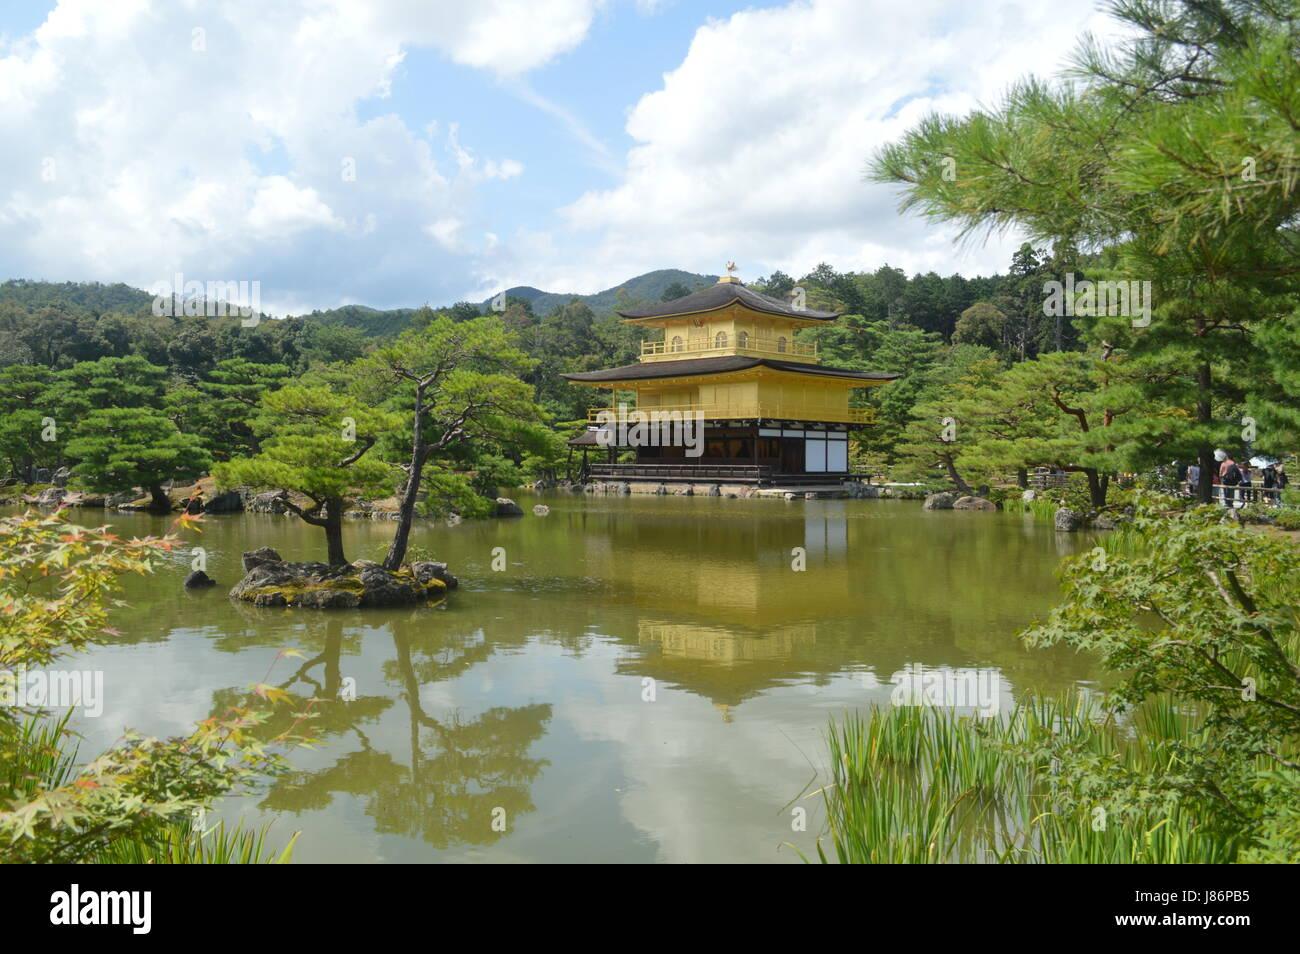 Kinkaku Ji at Kyoto in Japan - Pavillon d'or à Kyoto au Japon - Stock Image